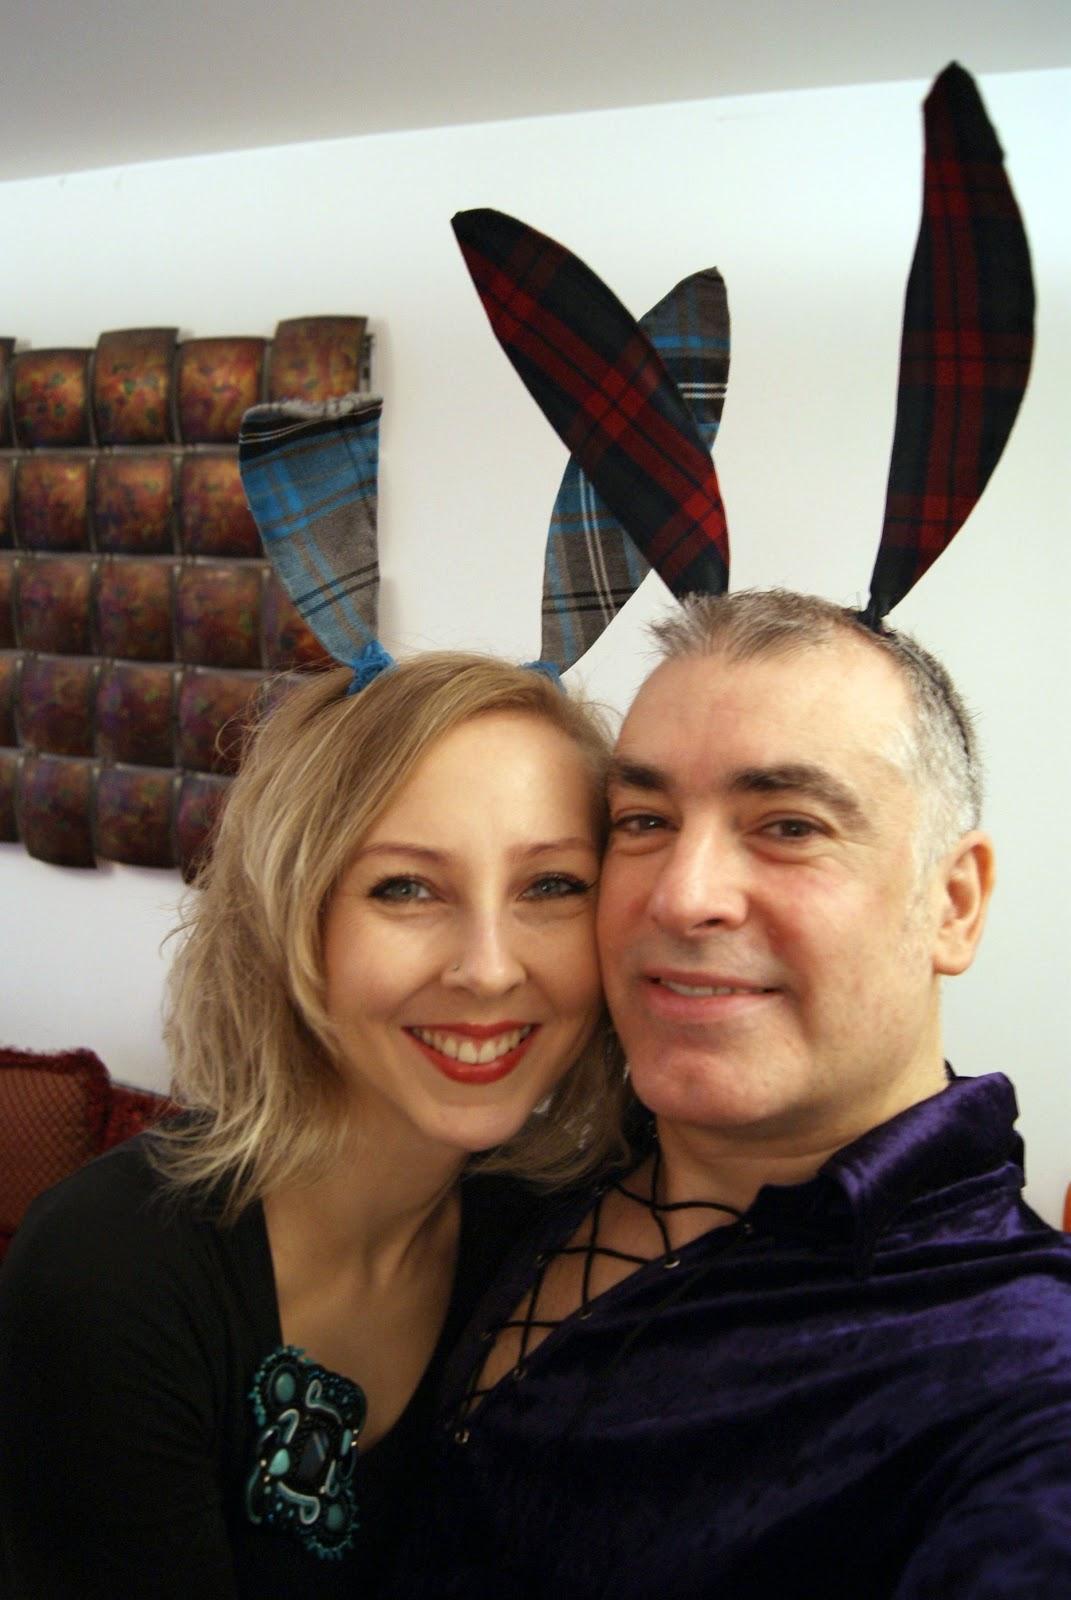 bunny ears, tartan, quirky vegans